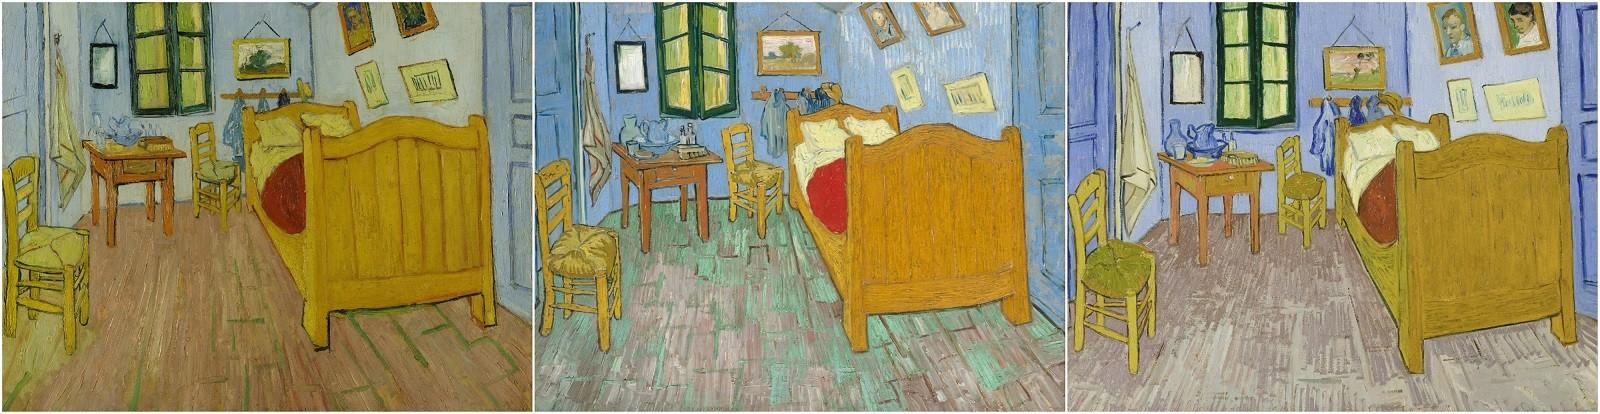 Camera Da Letto Van Gogh Amsterdam Parigi Chicago